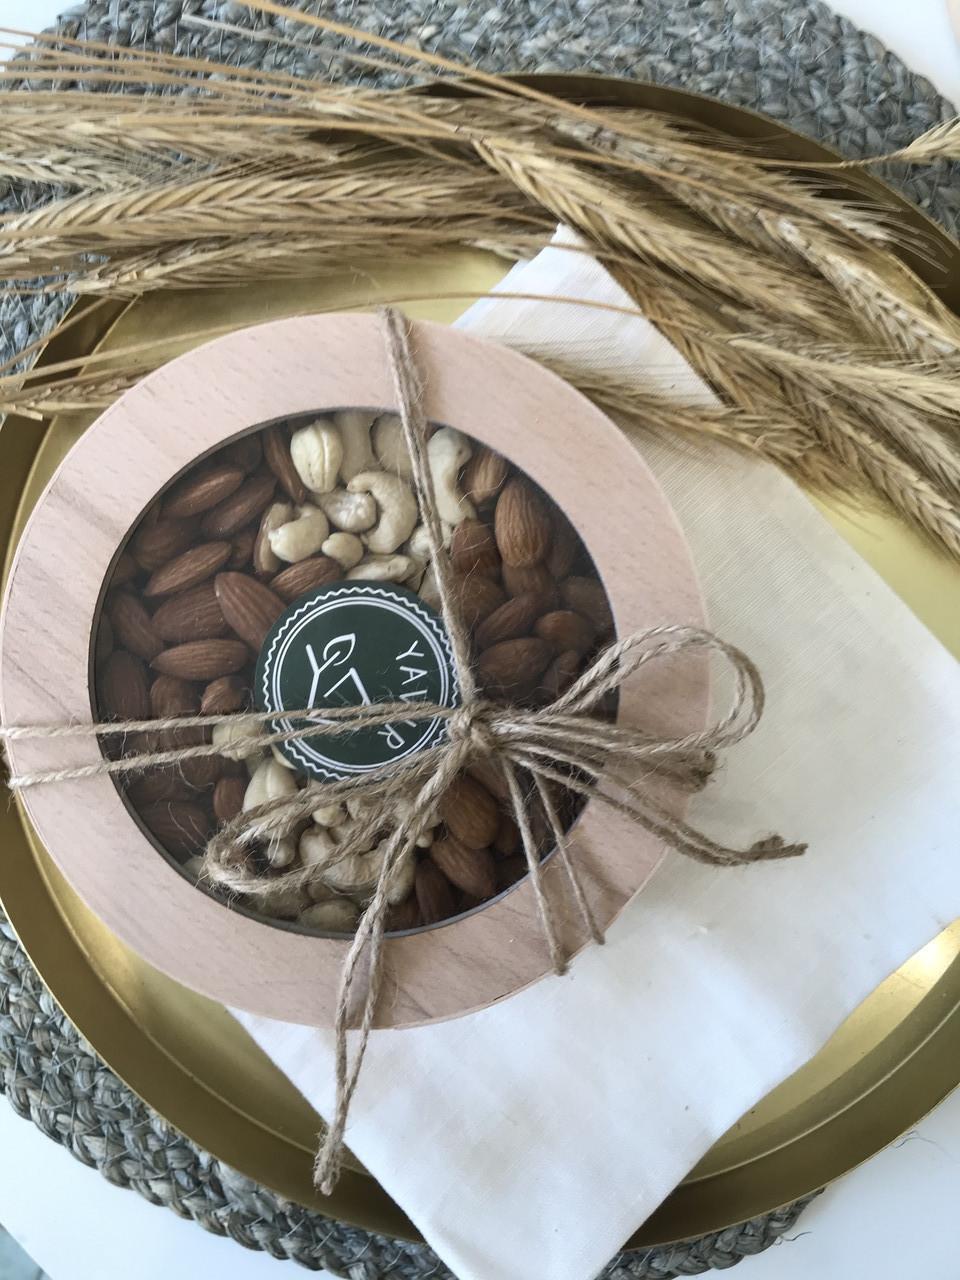 Подарунковий горіховий бокс (подарочный ореховый бокс)